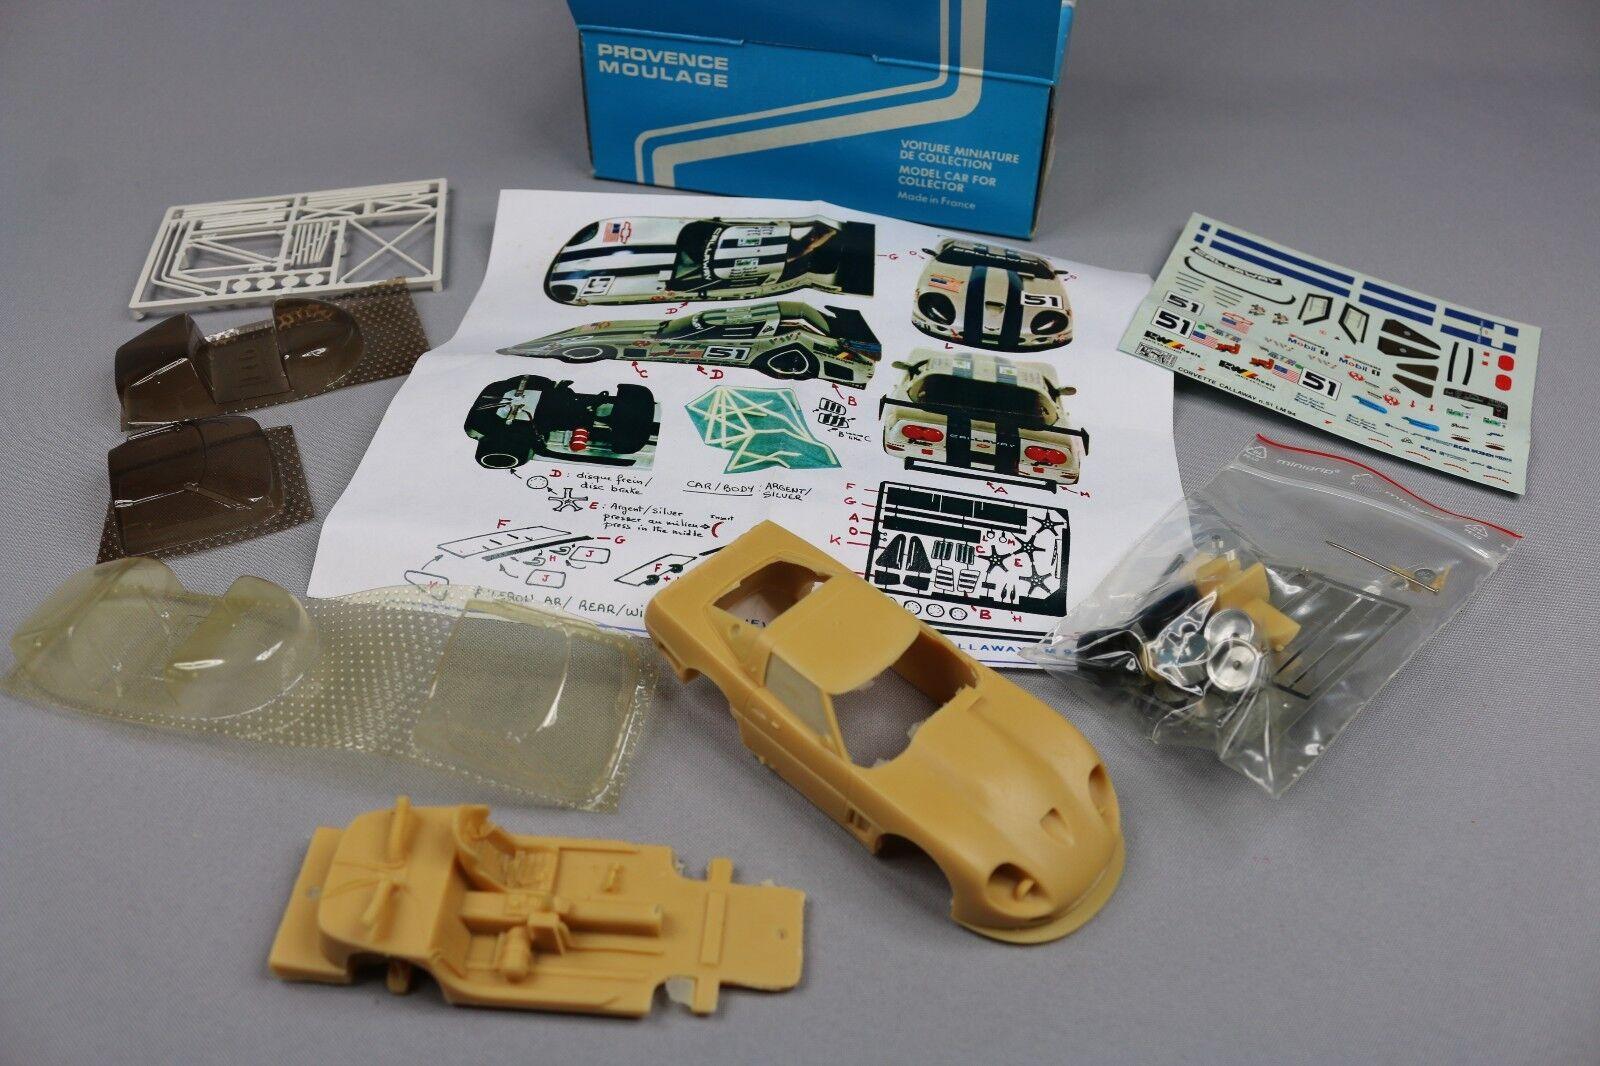 Zc516 provence moulage k911 kit 1   43 chevrolet corvette callaway - 1994